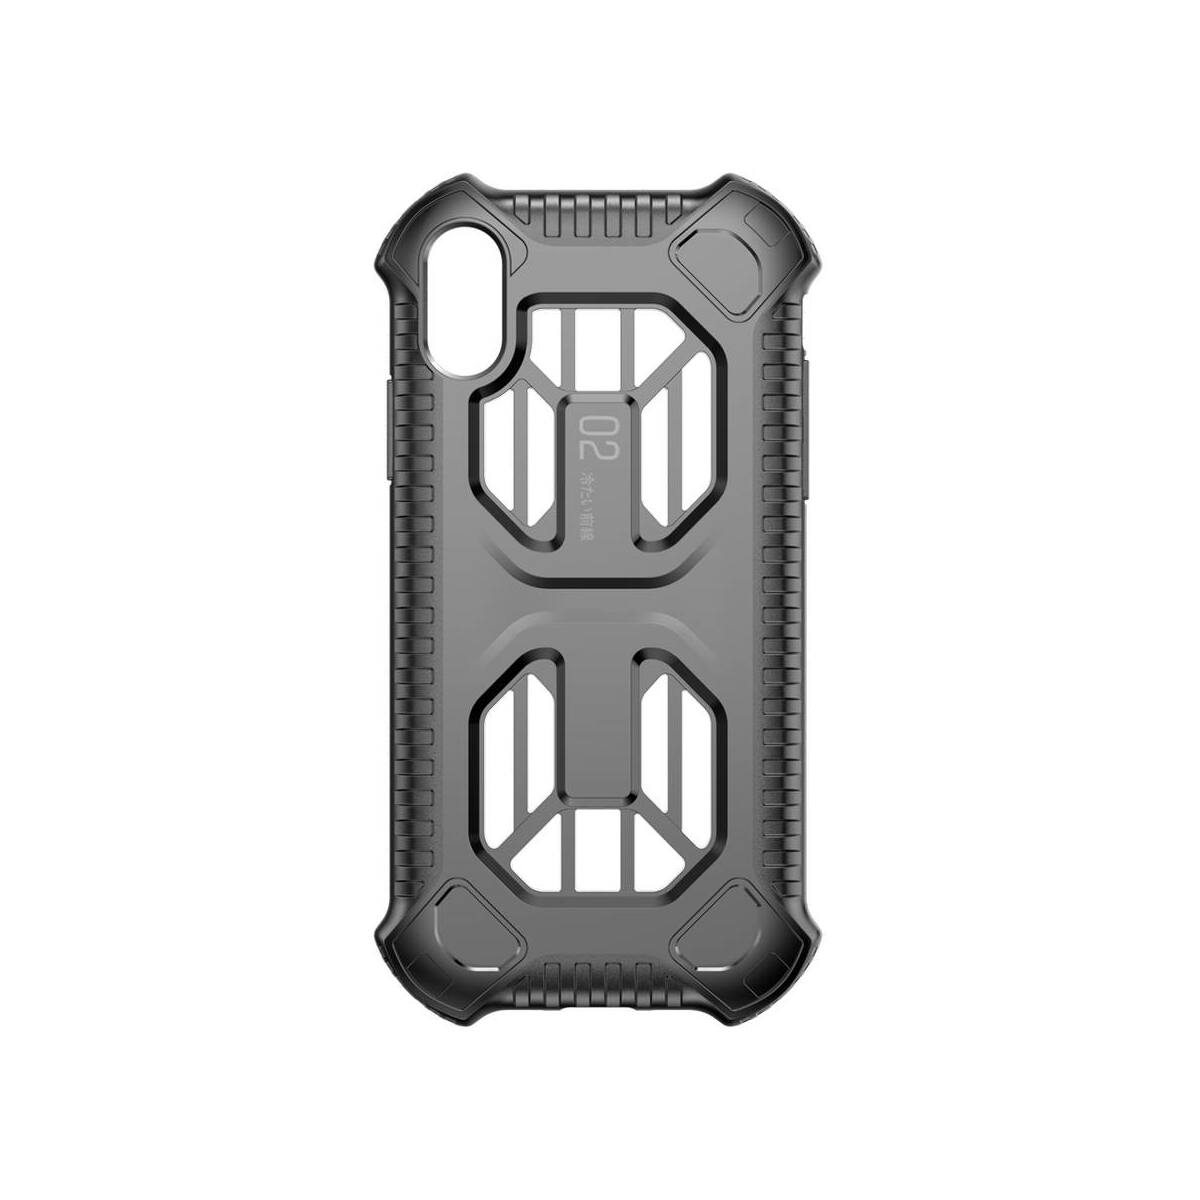 Baseus iPhone XS Max tok, Michelin védőburkolat, fekete (WIAPIPH65-LF01)